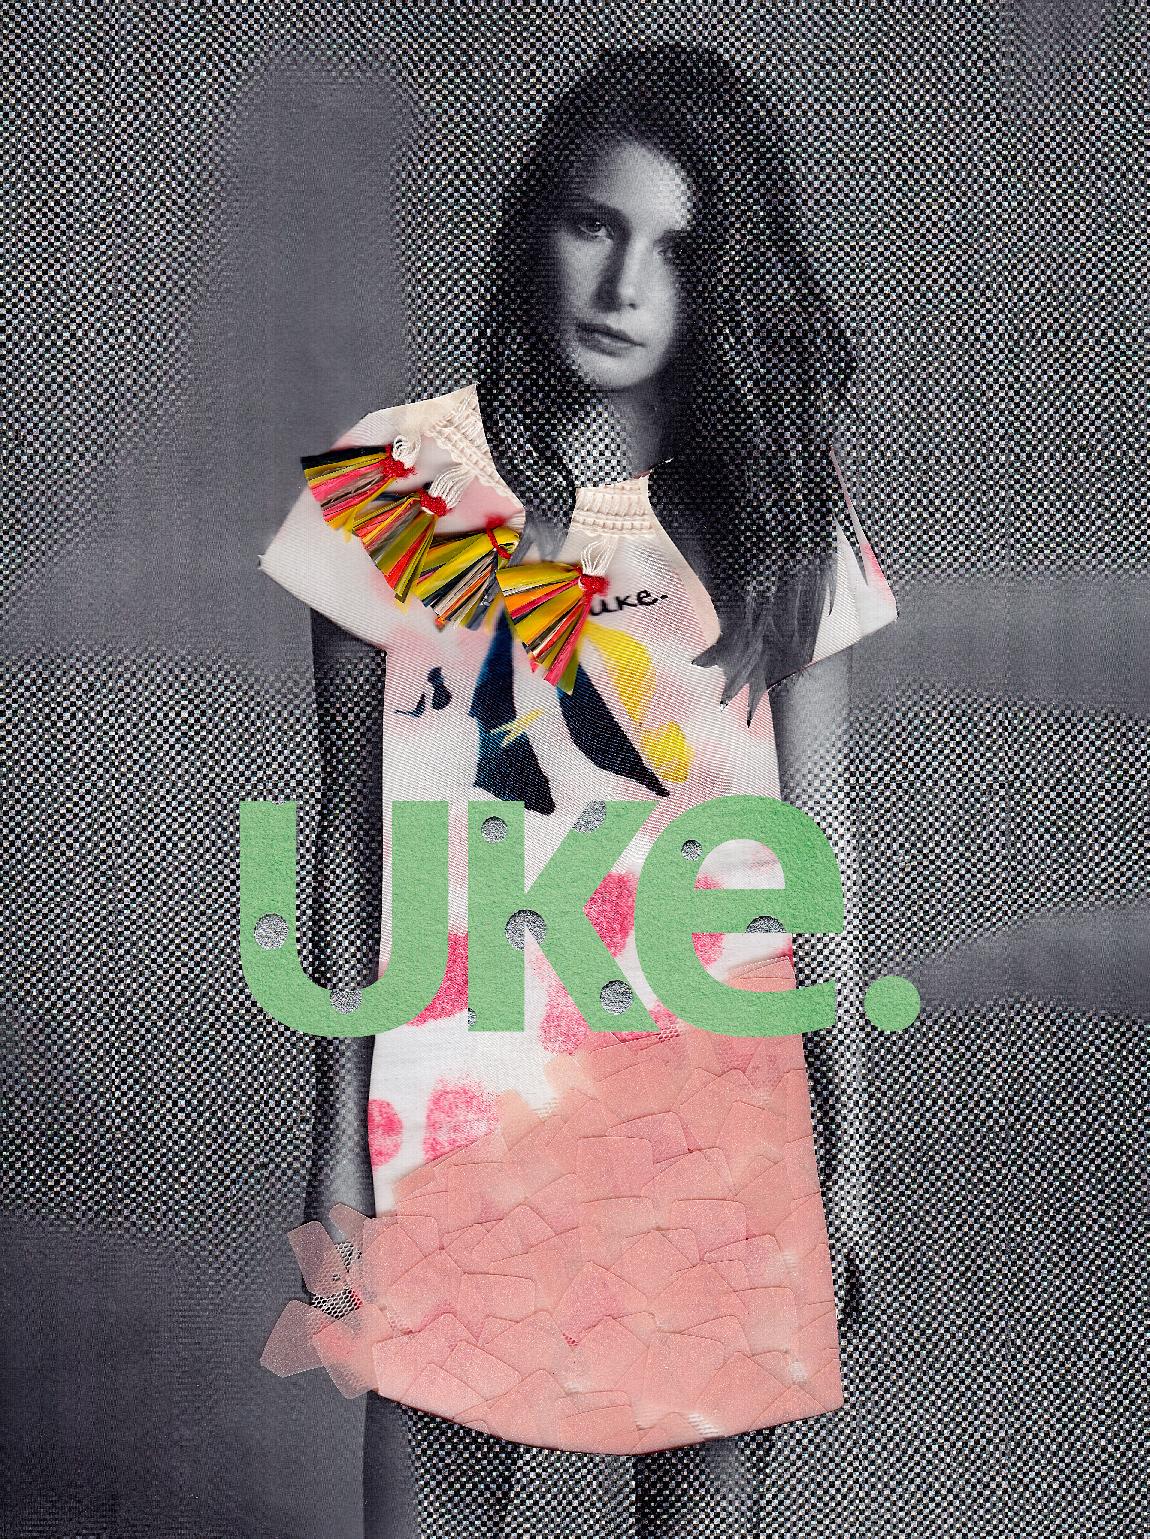 UKE. by Eugenia Alejos